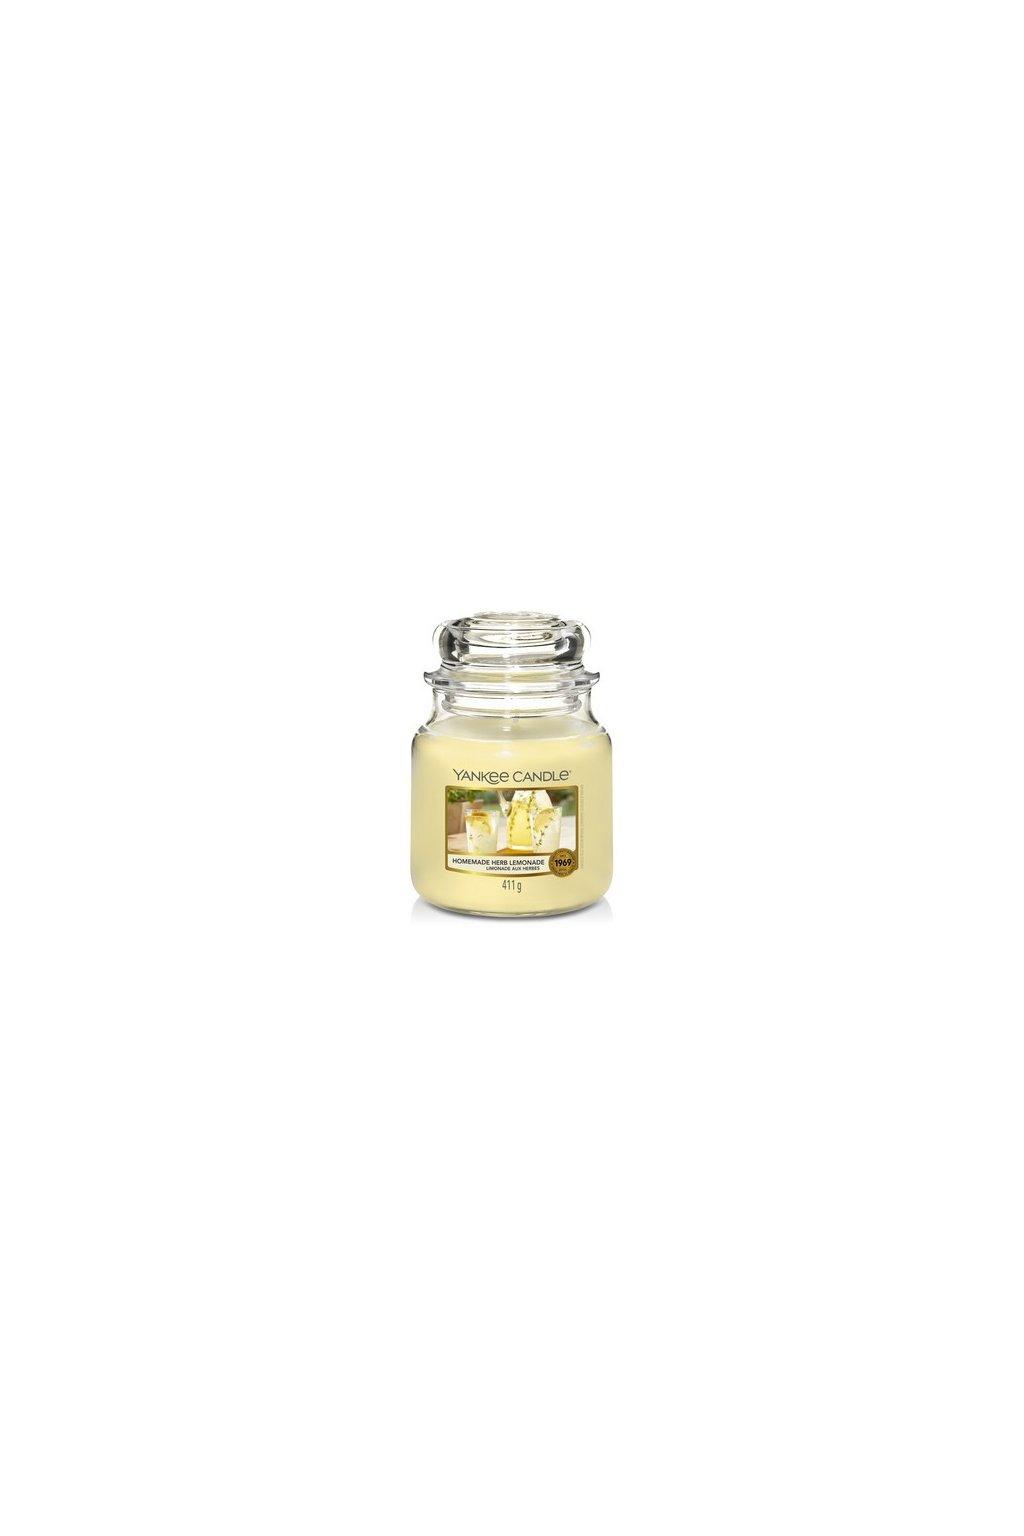 YANKEE CANDLE Homemade Herb Lemonade 411g